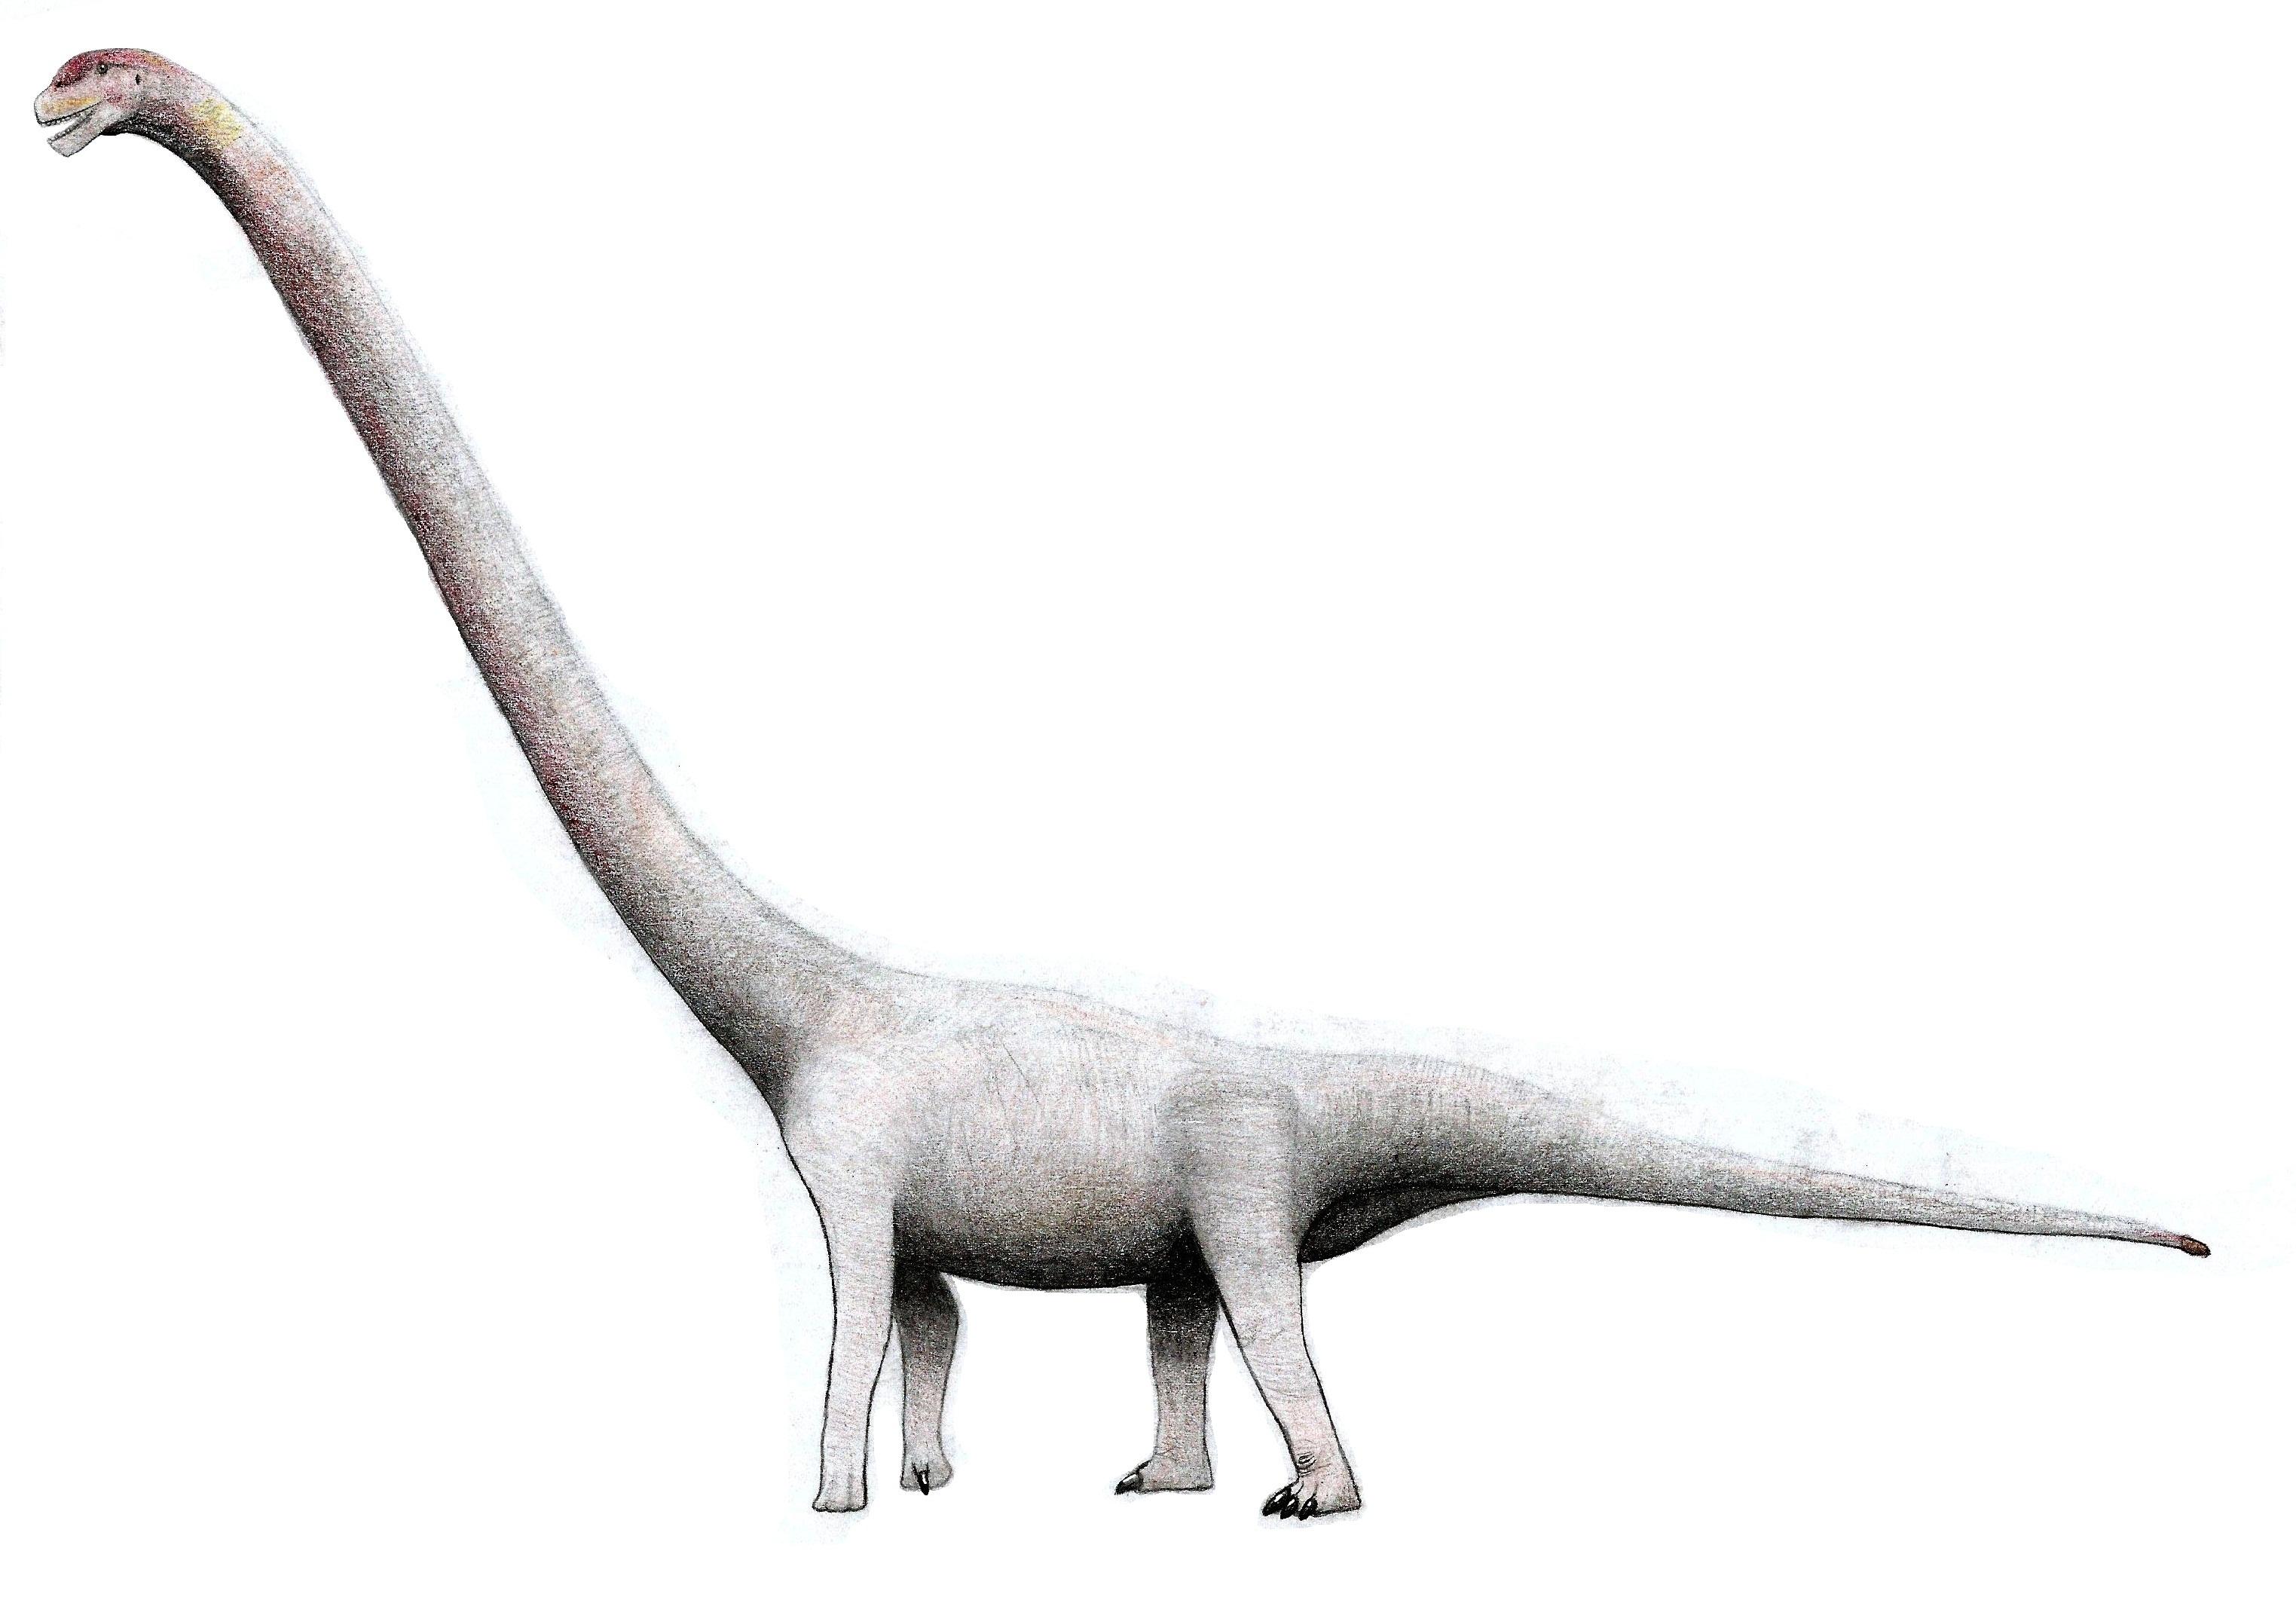 Image of Omeisaurus